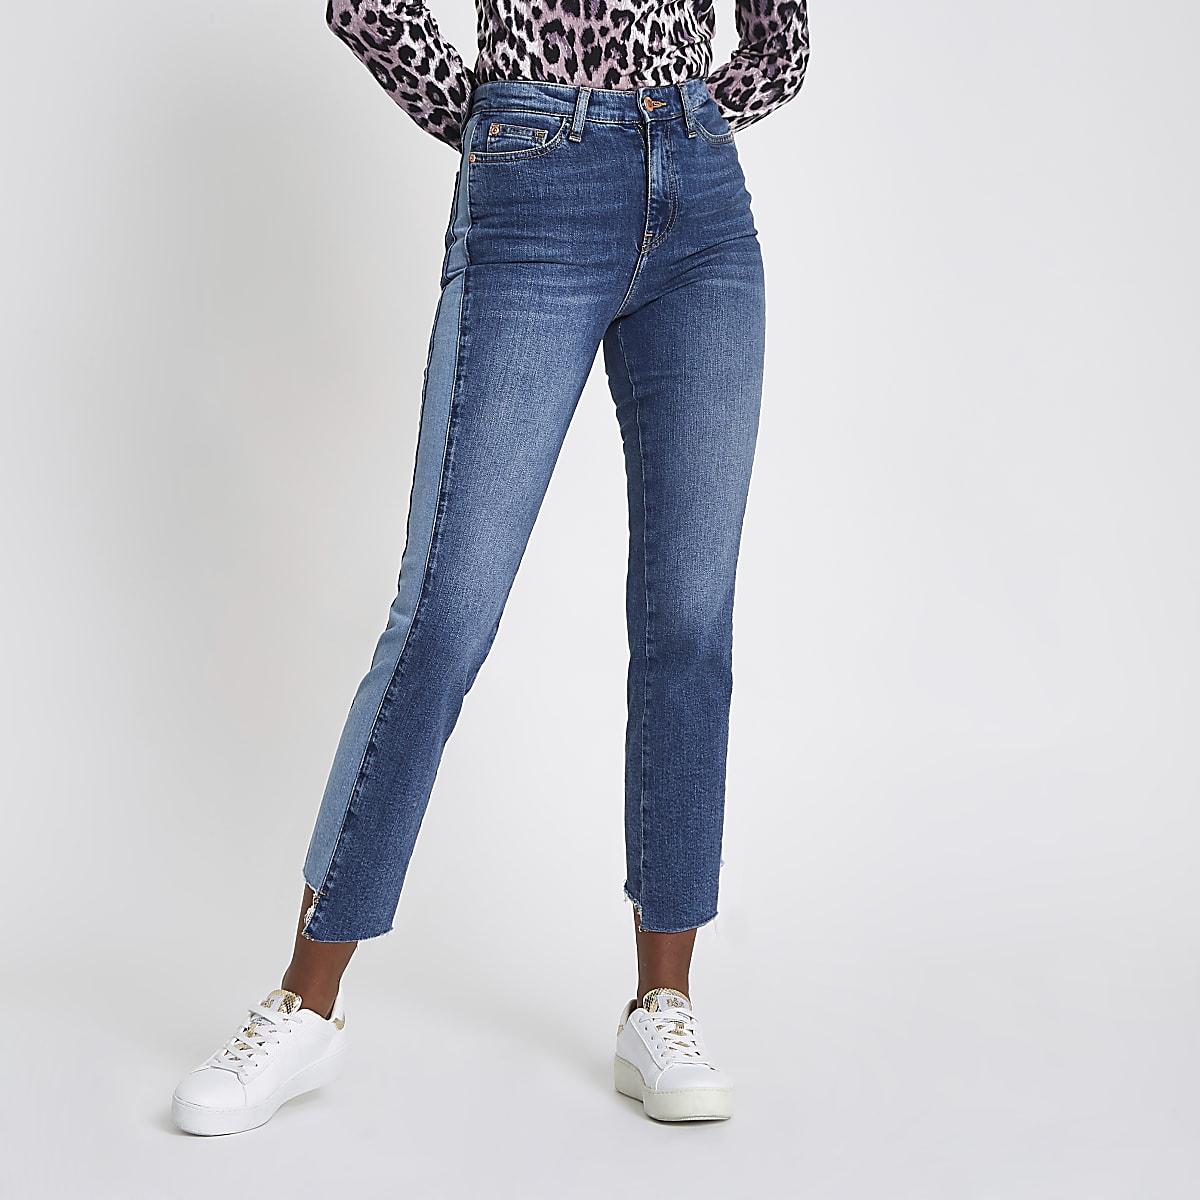 71780bc6ae Mid blue Bella straight leg panel jeans - Straight & Slim Jeans - Jeans -  women